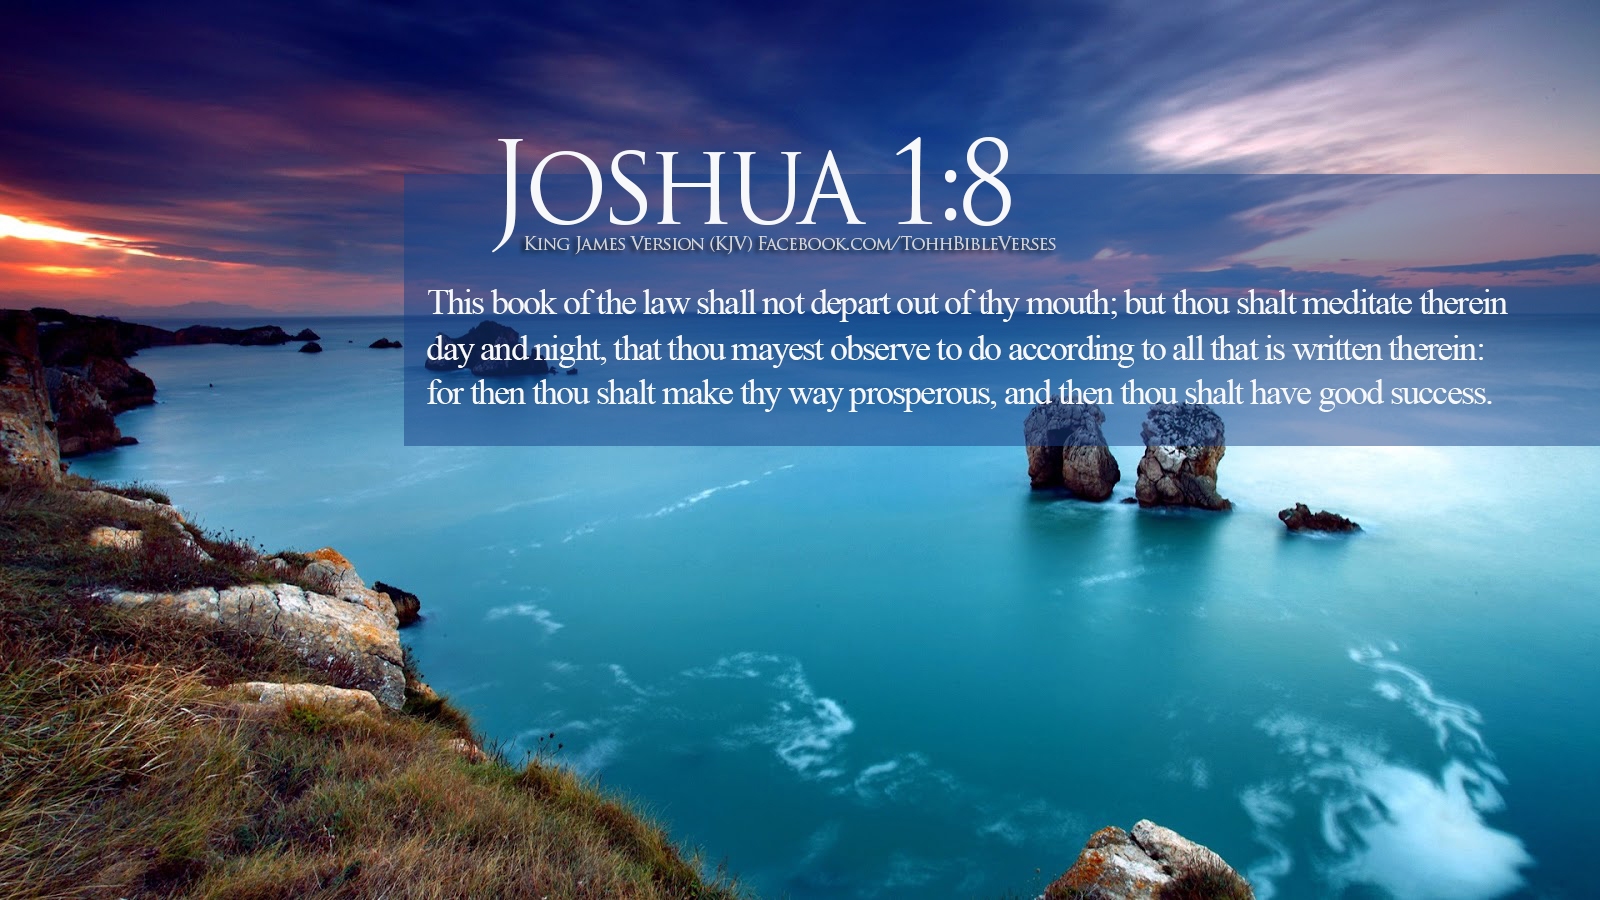 Christian quotes for desktop ocean quotesgram - Full hd bible wallpapers ...